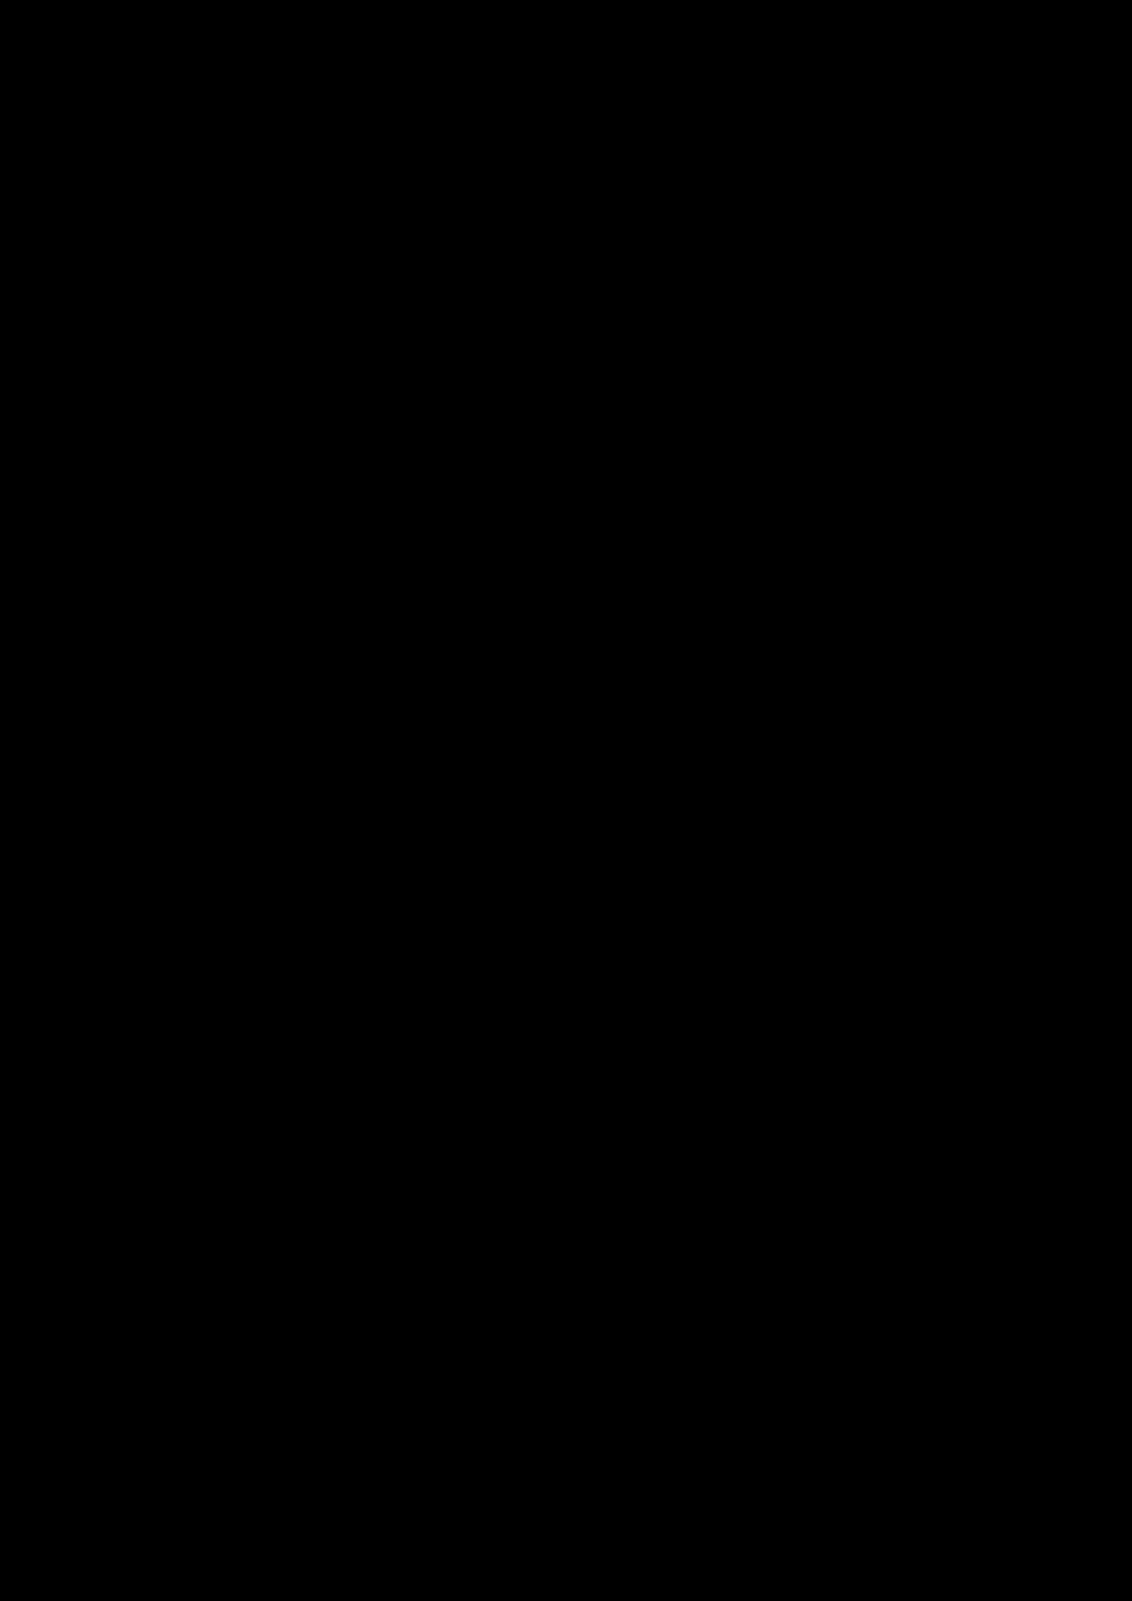 Ten lyubvi slide, Image 54